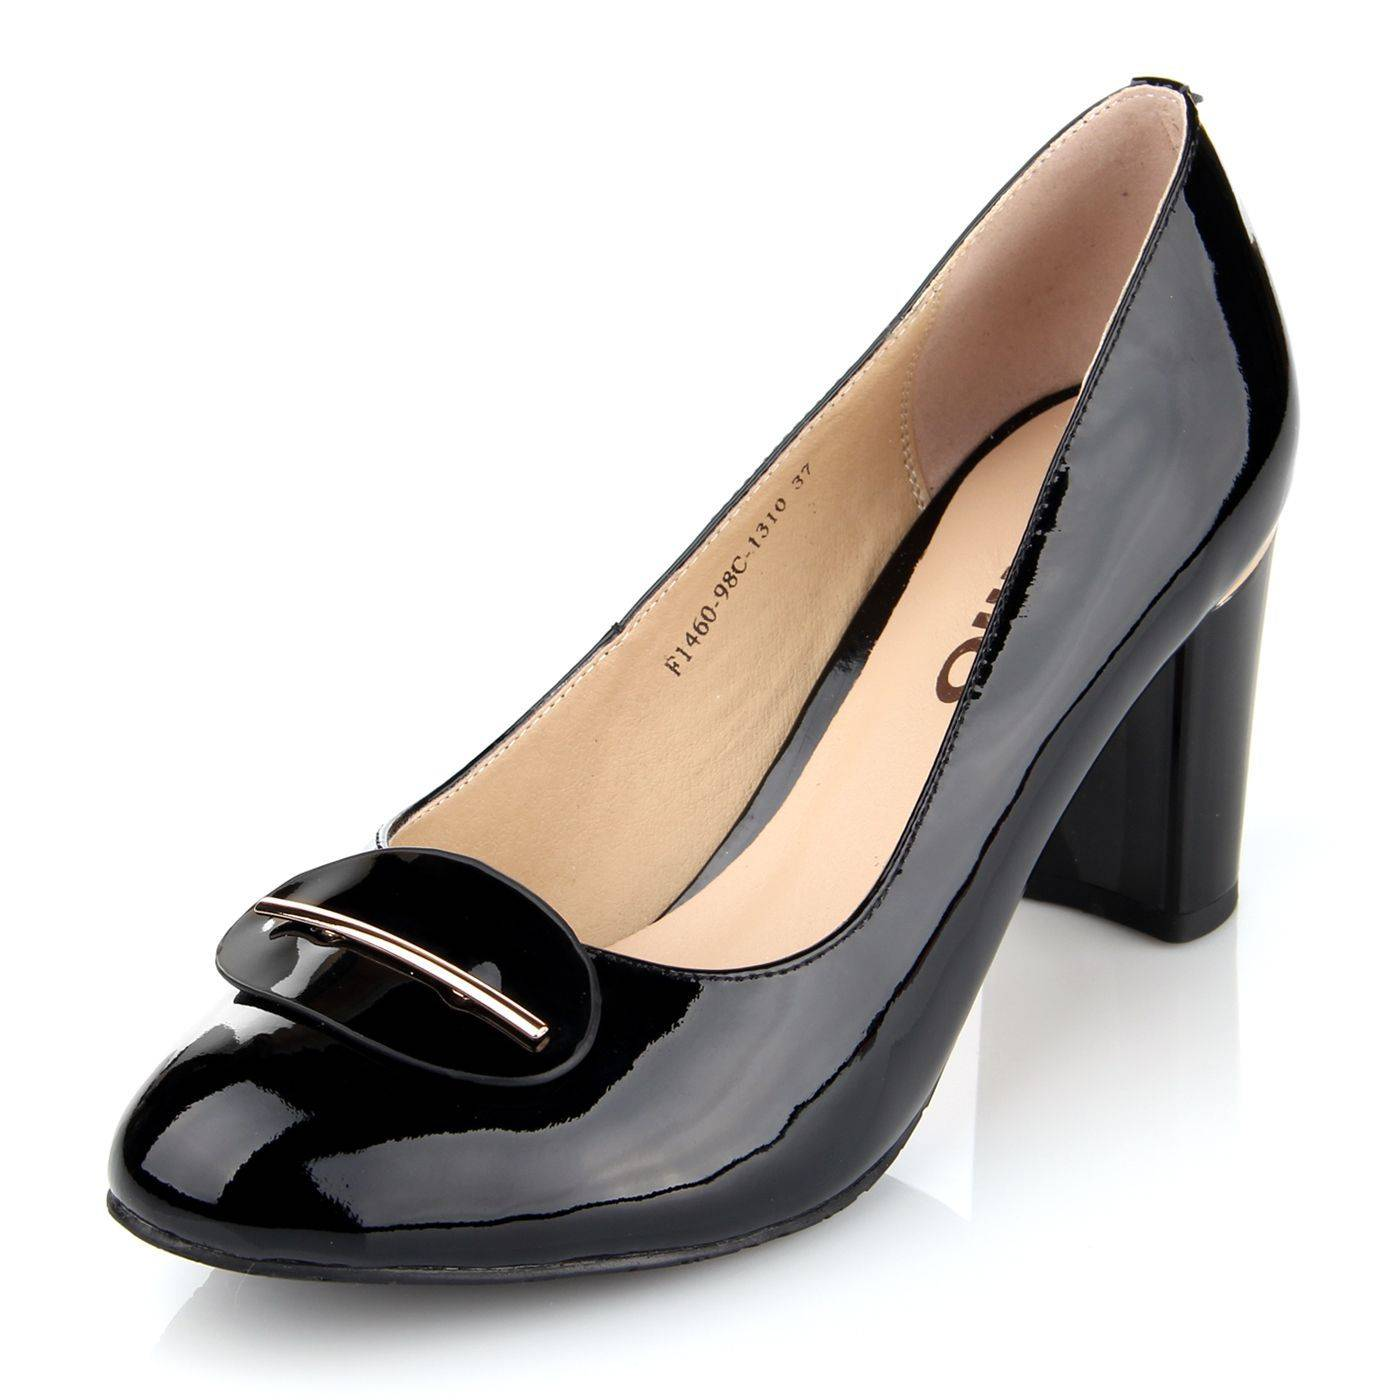 Туфлі жіночі ditto 2027 Чорний купить по выгодной цене в интернет ... b138f06f2ca73